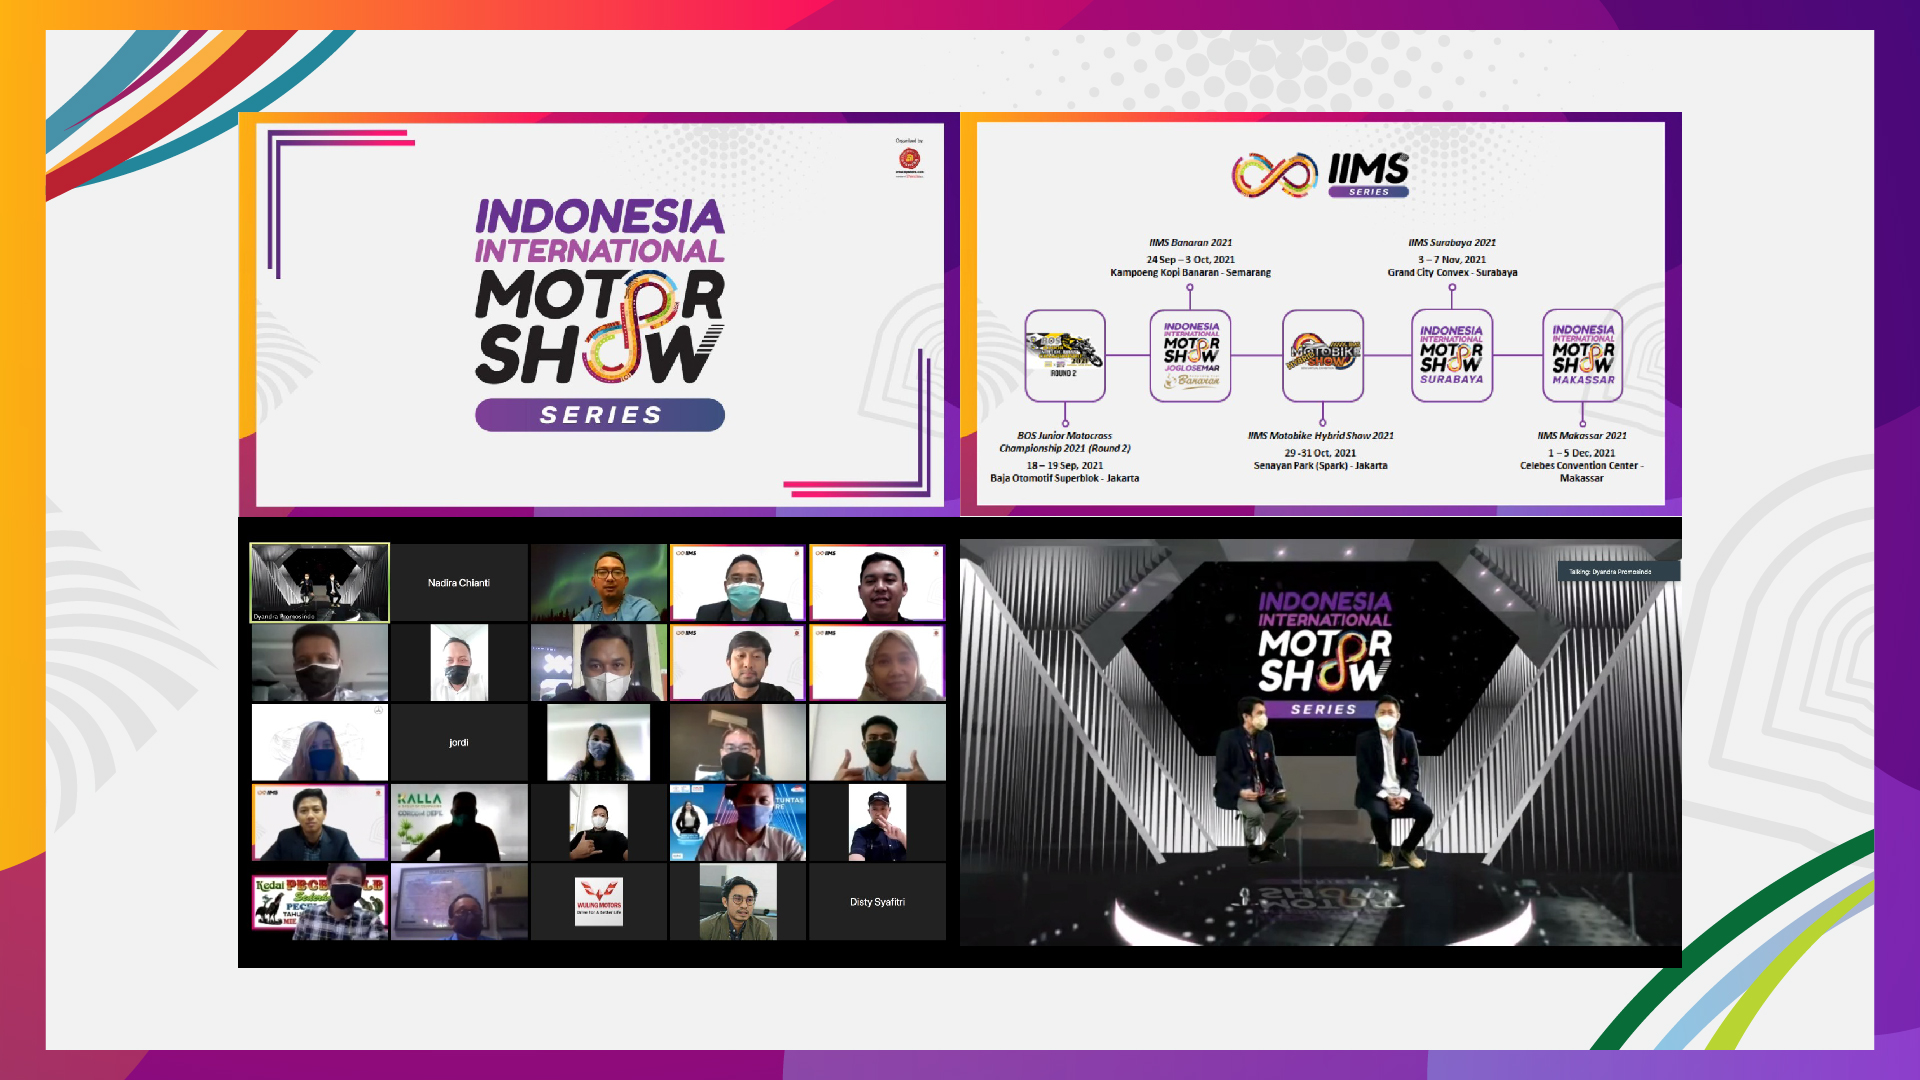 Dedikasi terhadap Industri Otomotif,  Dyandra Promosindo persembahkan  Indonesia International Motor Show Series